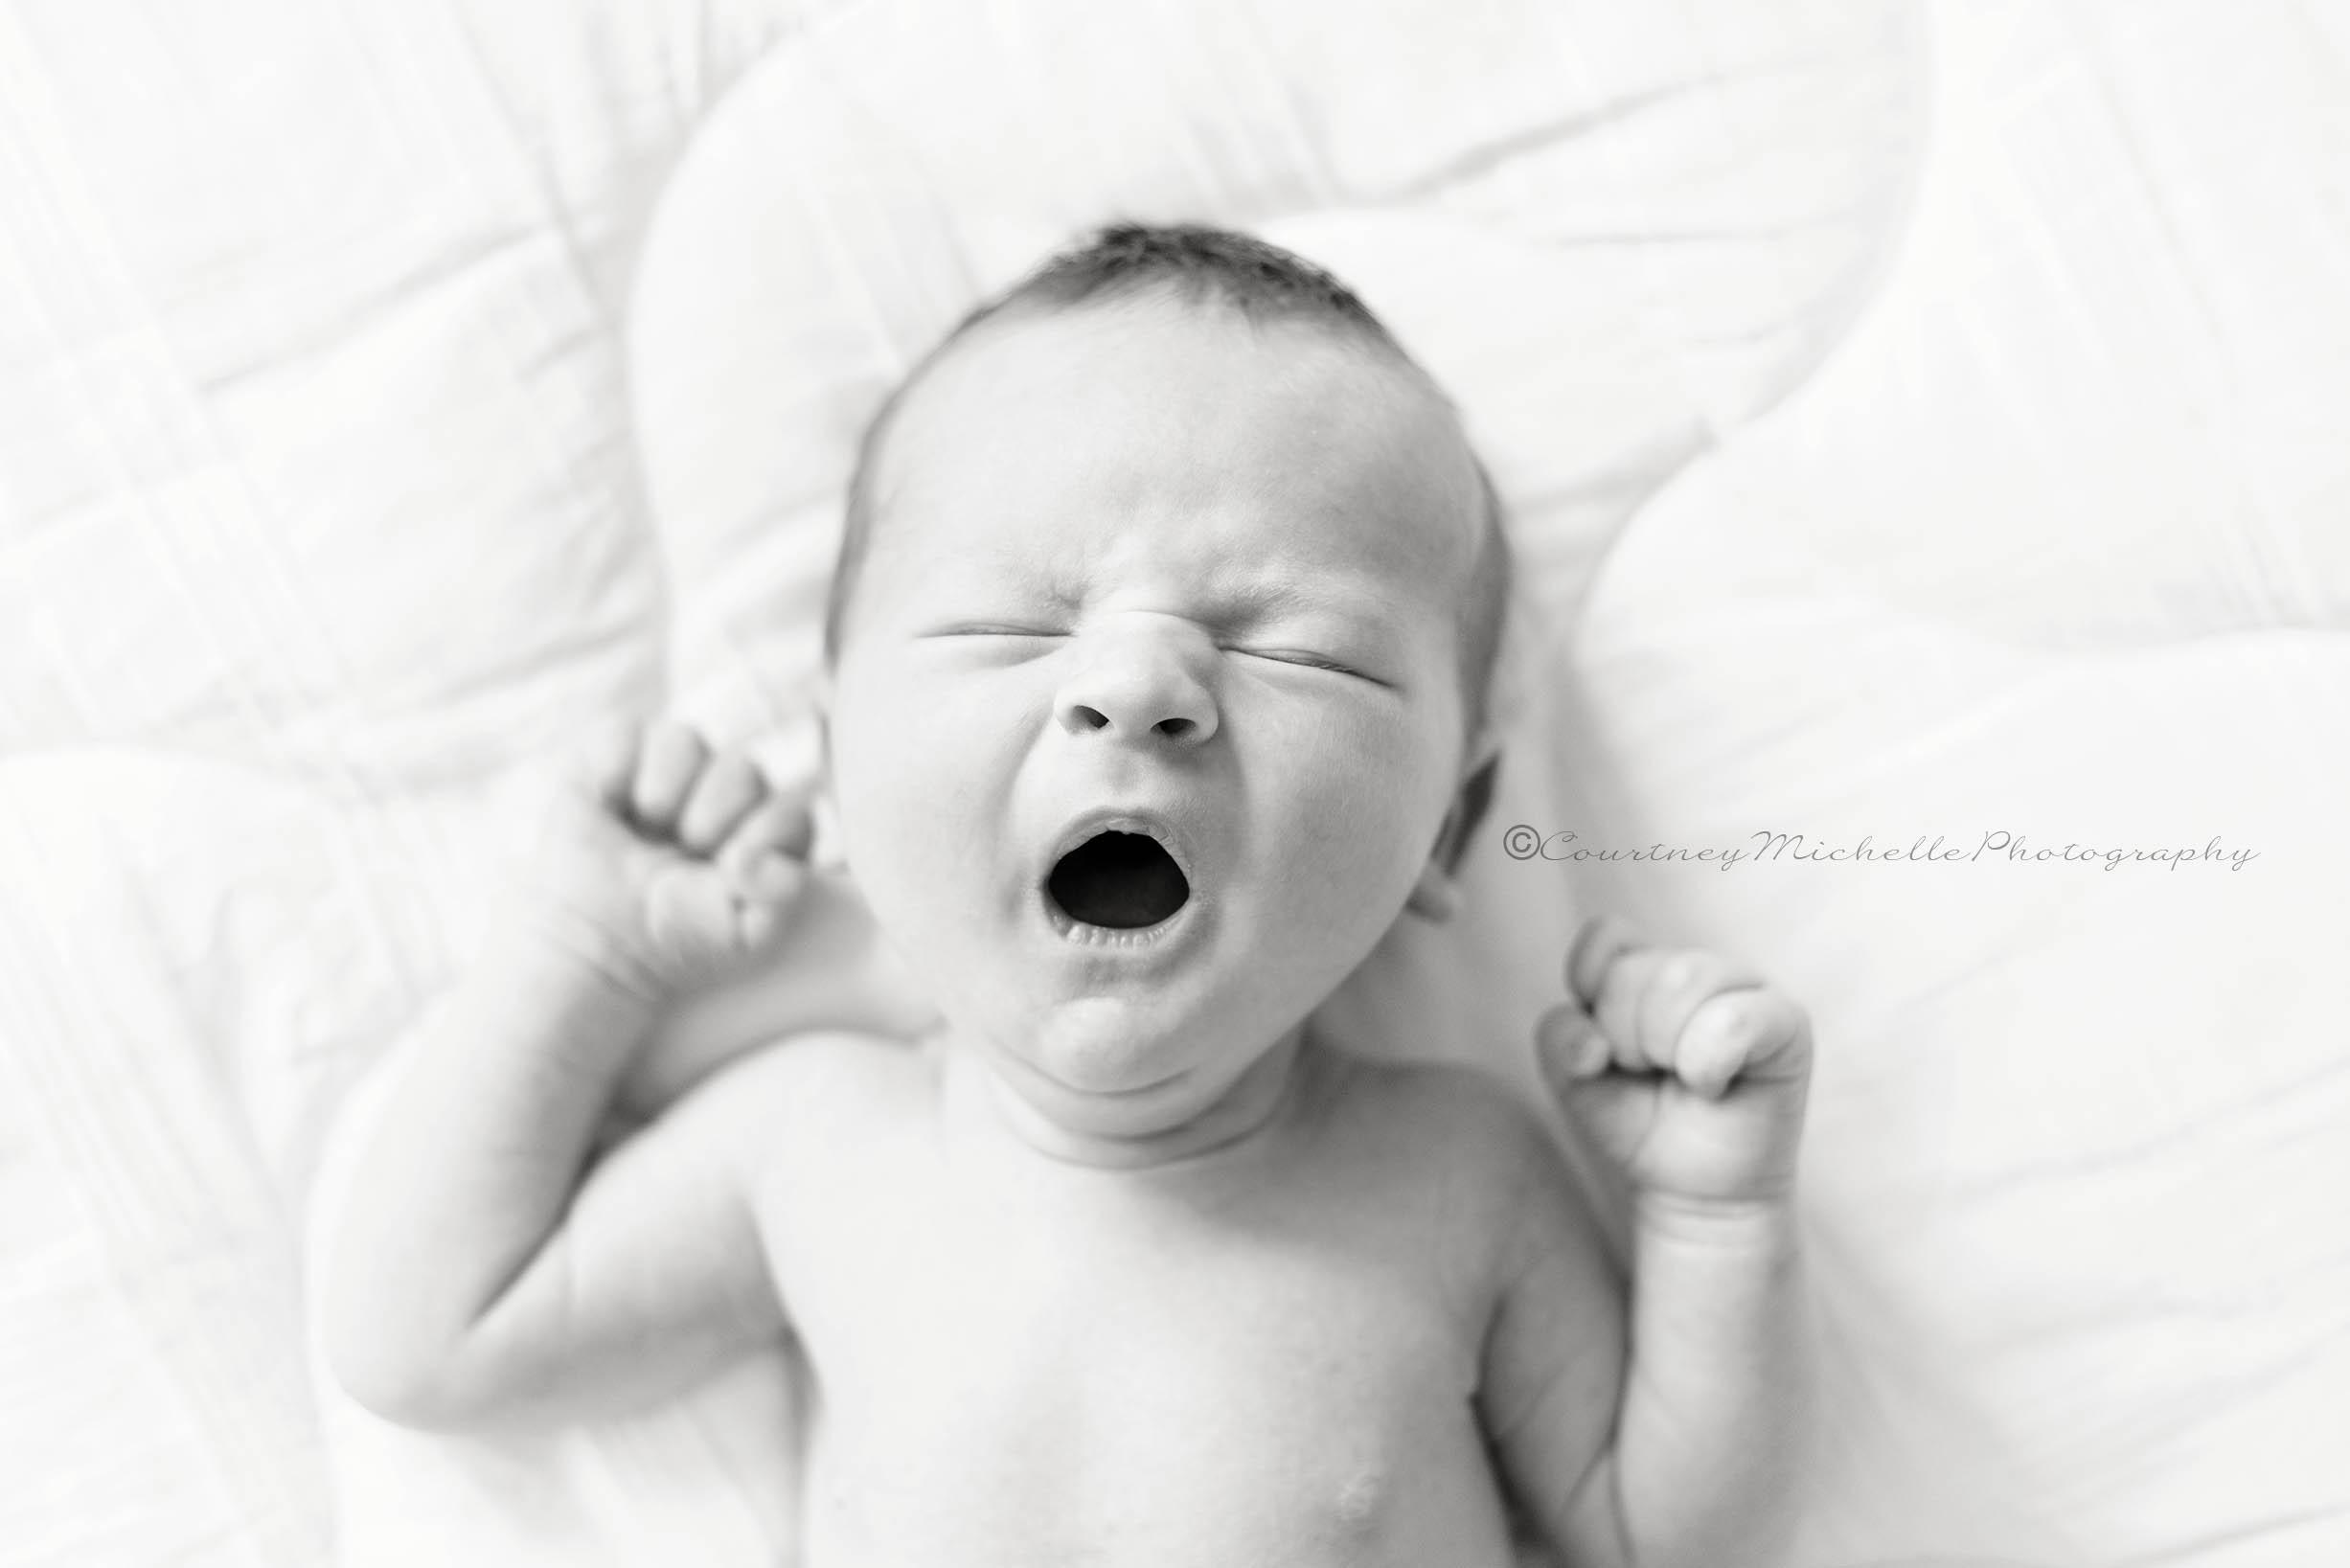 chicago-newborn-photographer-courtney-laper-lifestyle-©COPYRIGHTCMP-7938_edit.jpg